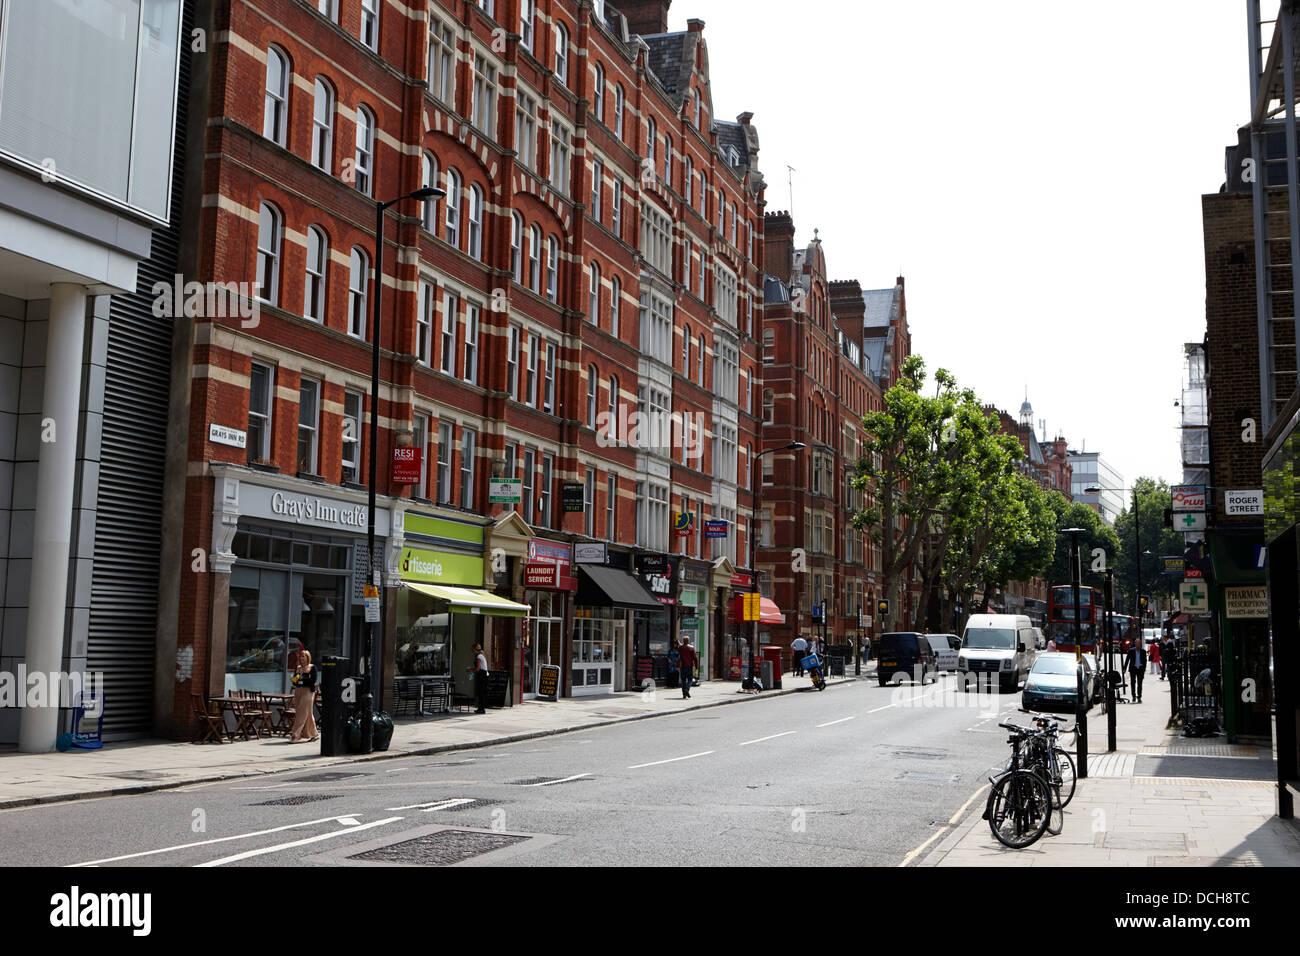 grays inn road London England UK - Stock Image